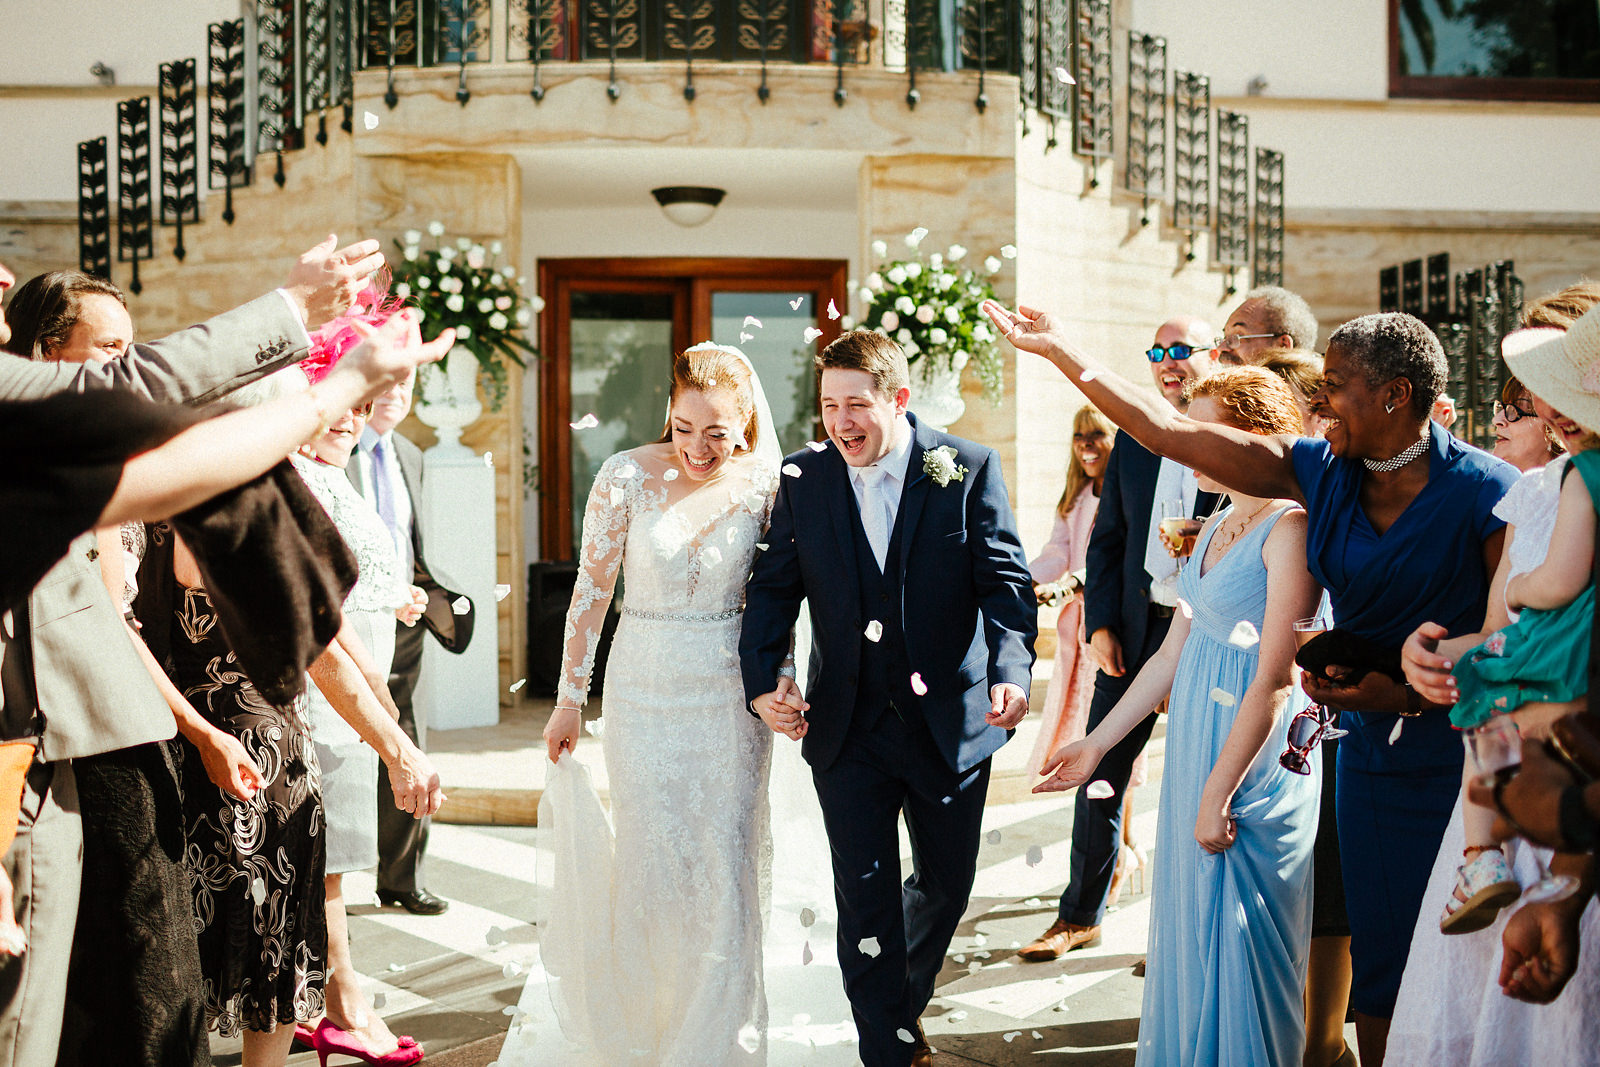 Wedding ceremony photos at Villa Antiche Mura Sorrento